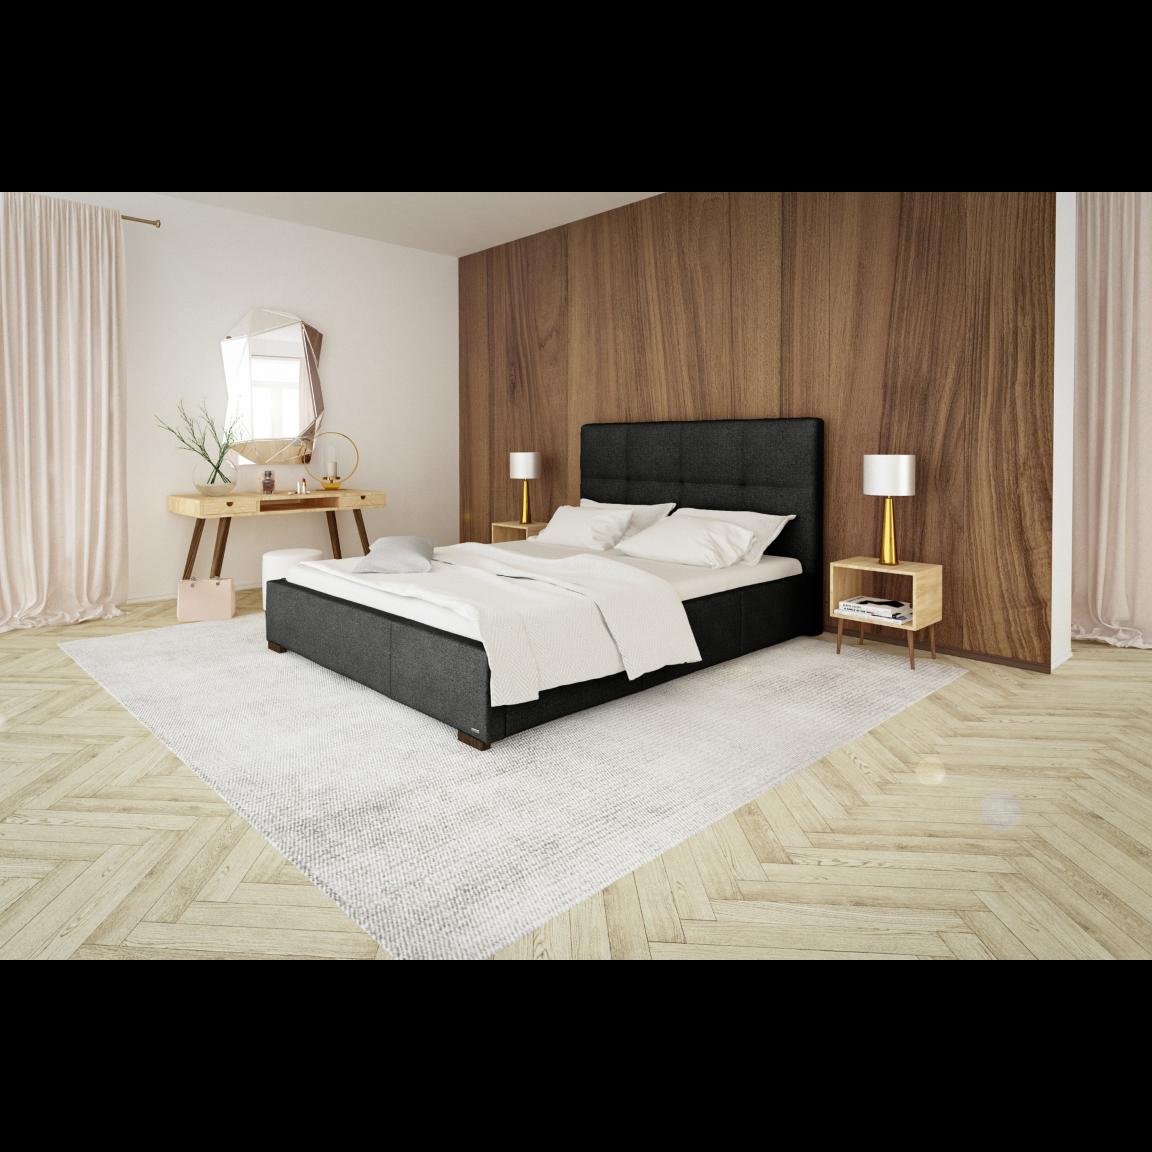 2nd Life Item   Upholstered Bed Cobalt with Storage Room   Black-140 x 200 cm